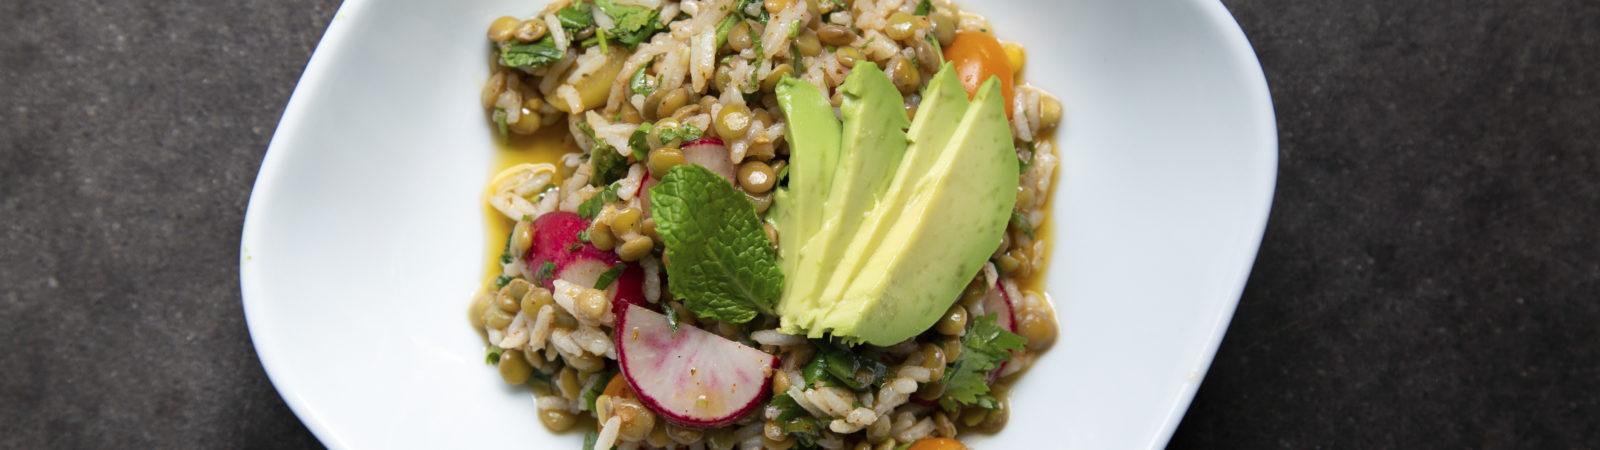 Rice and Lentil Salad